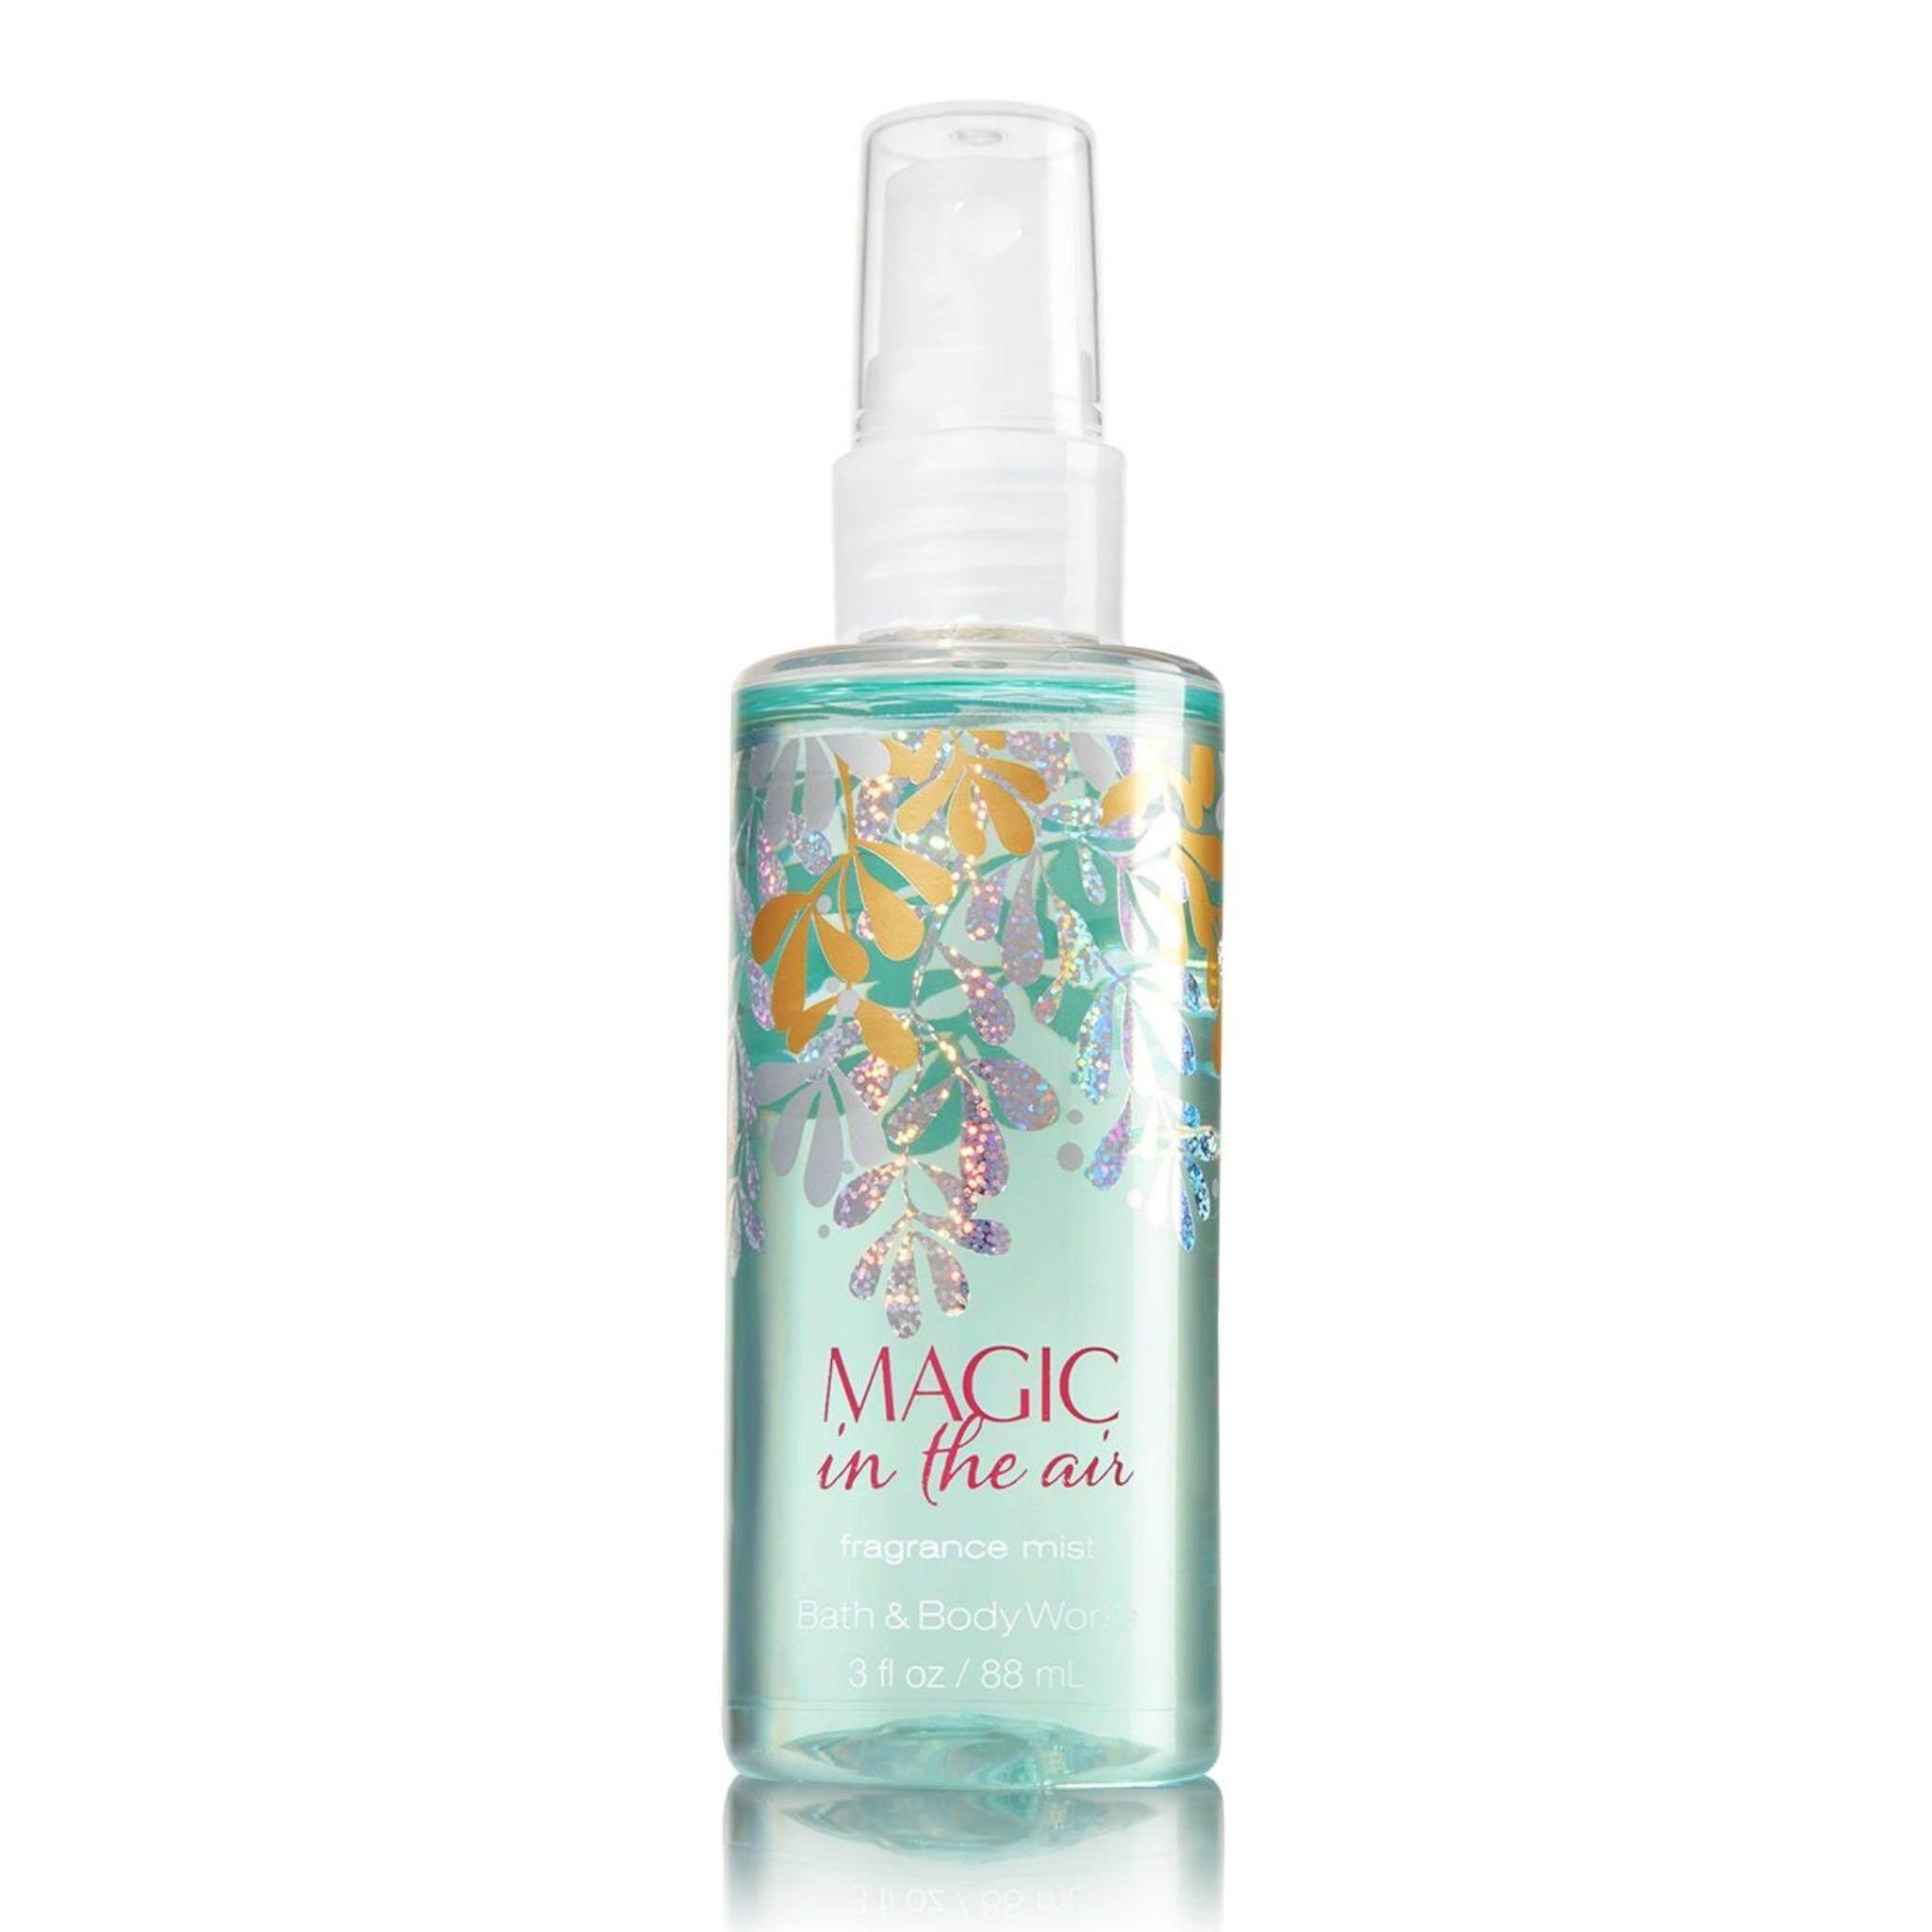 Bath & Body Works Magic In The Air Mist, ...